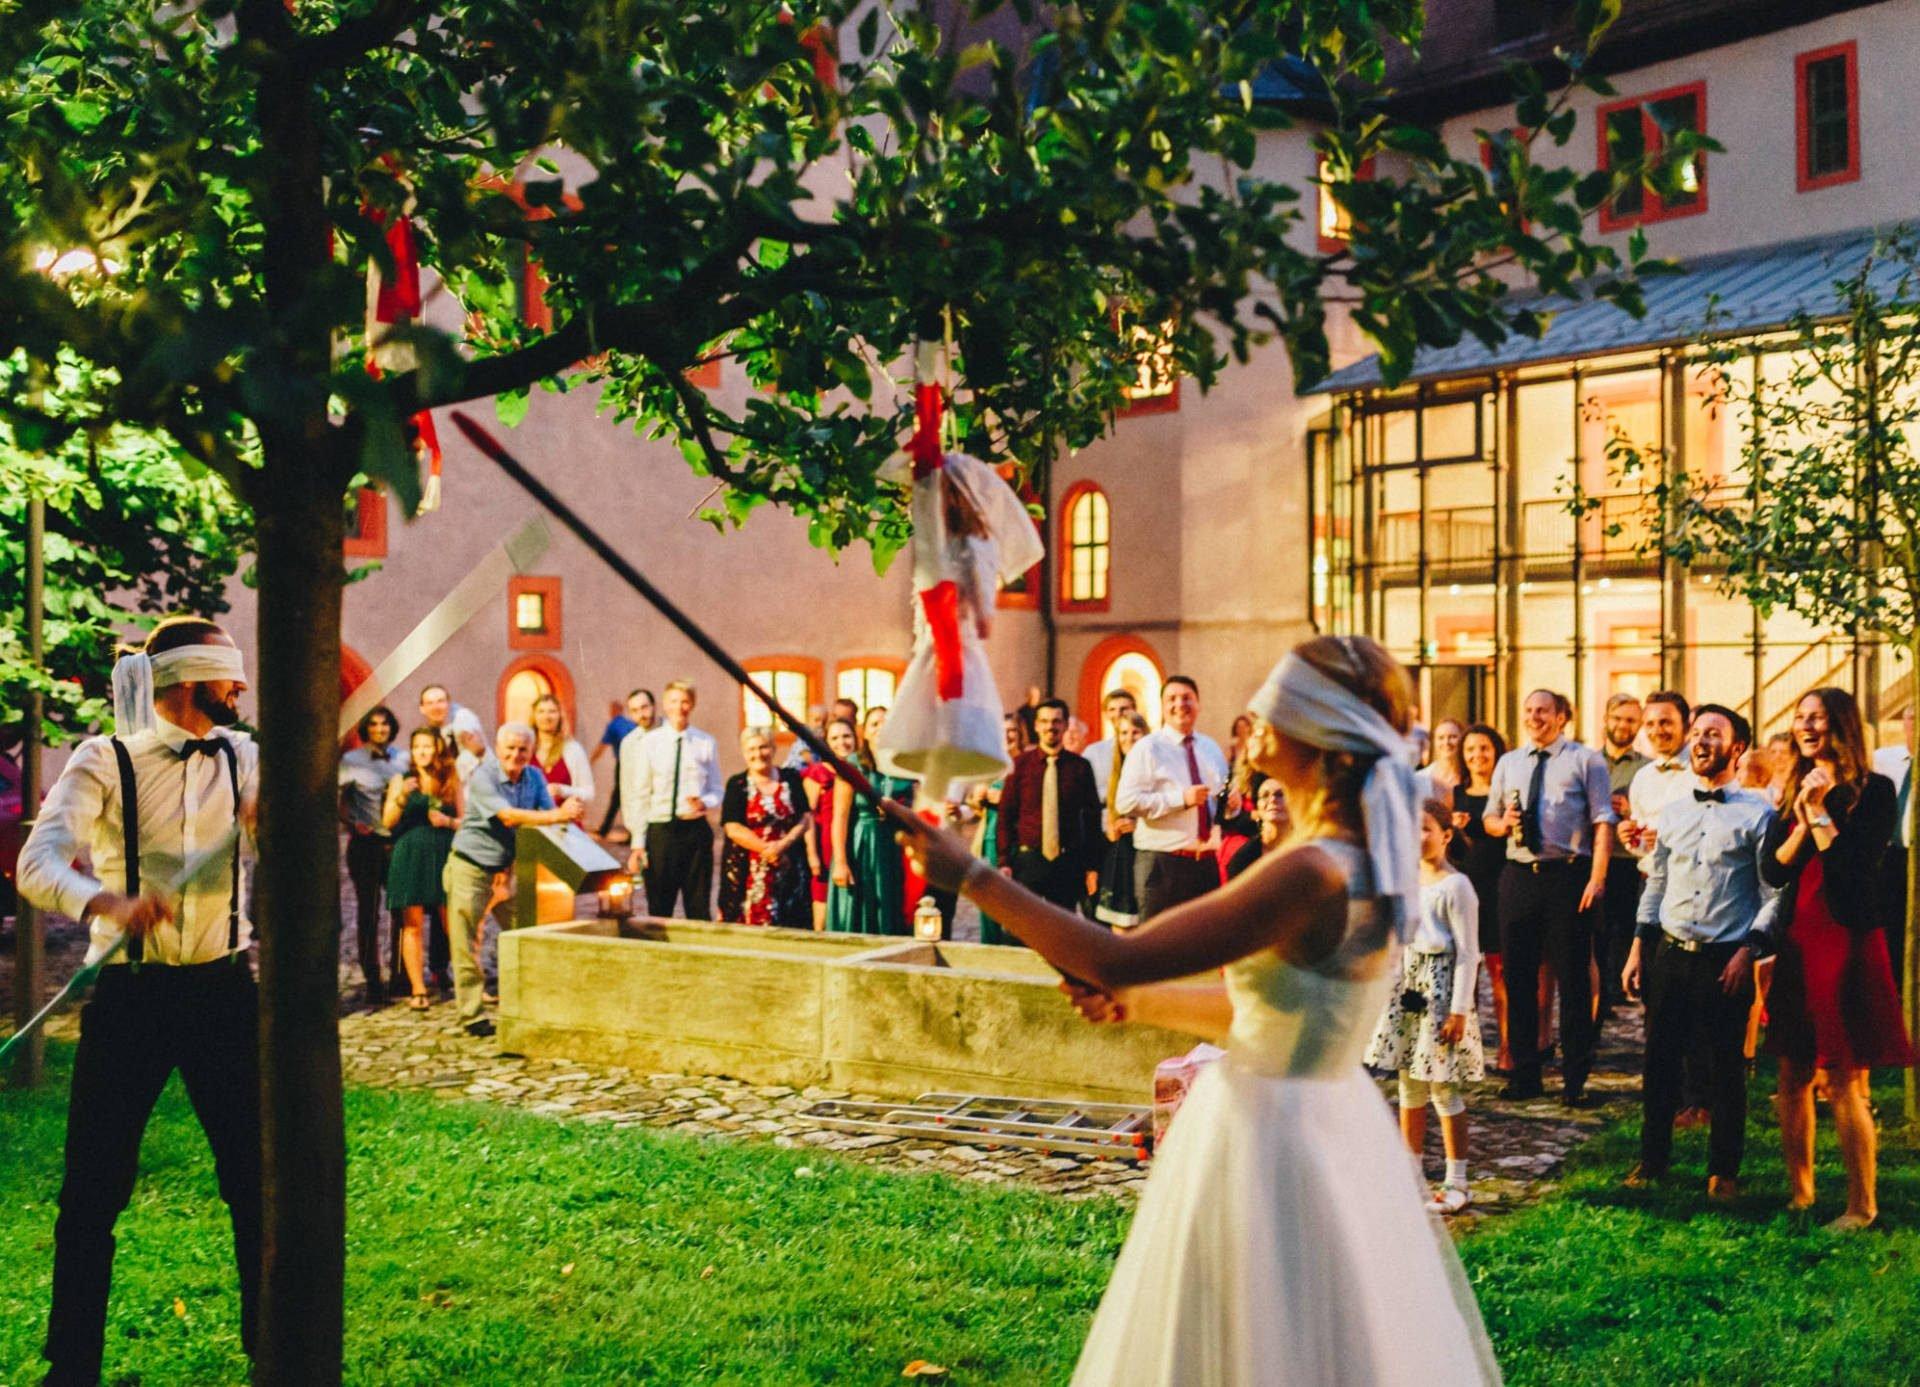 JuleSascha 55 1920x1387 - Hochzeit im alten Dornburger Schloss